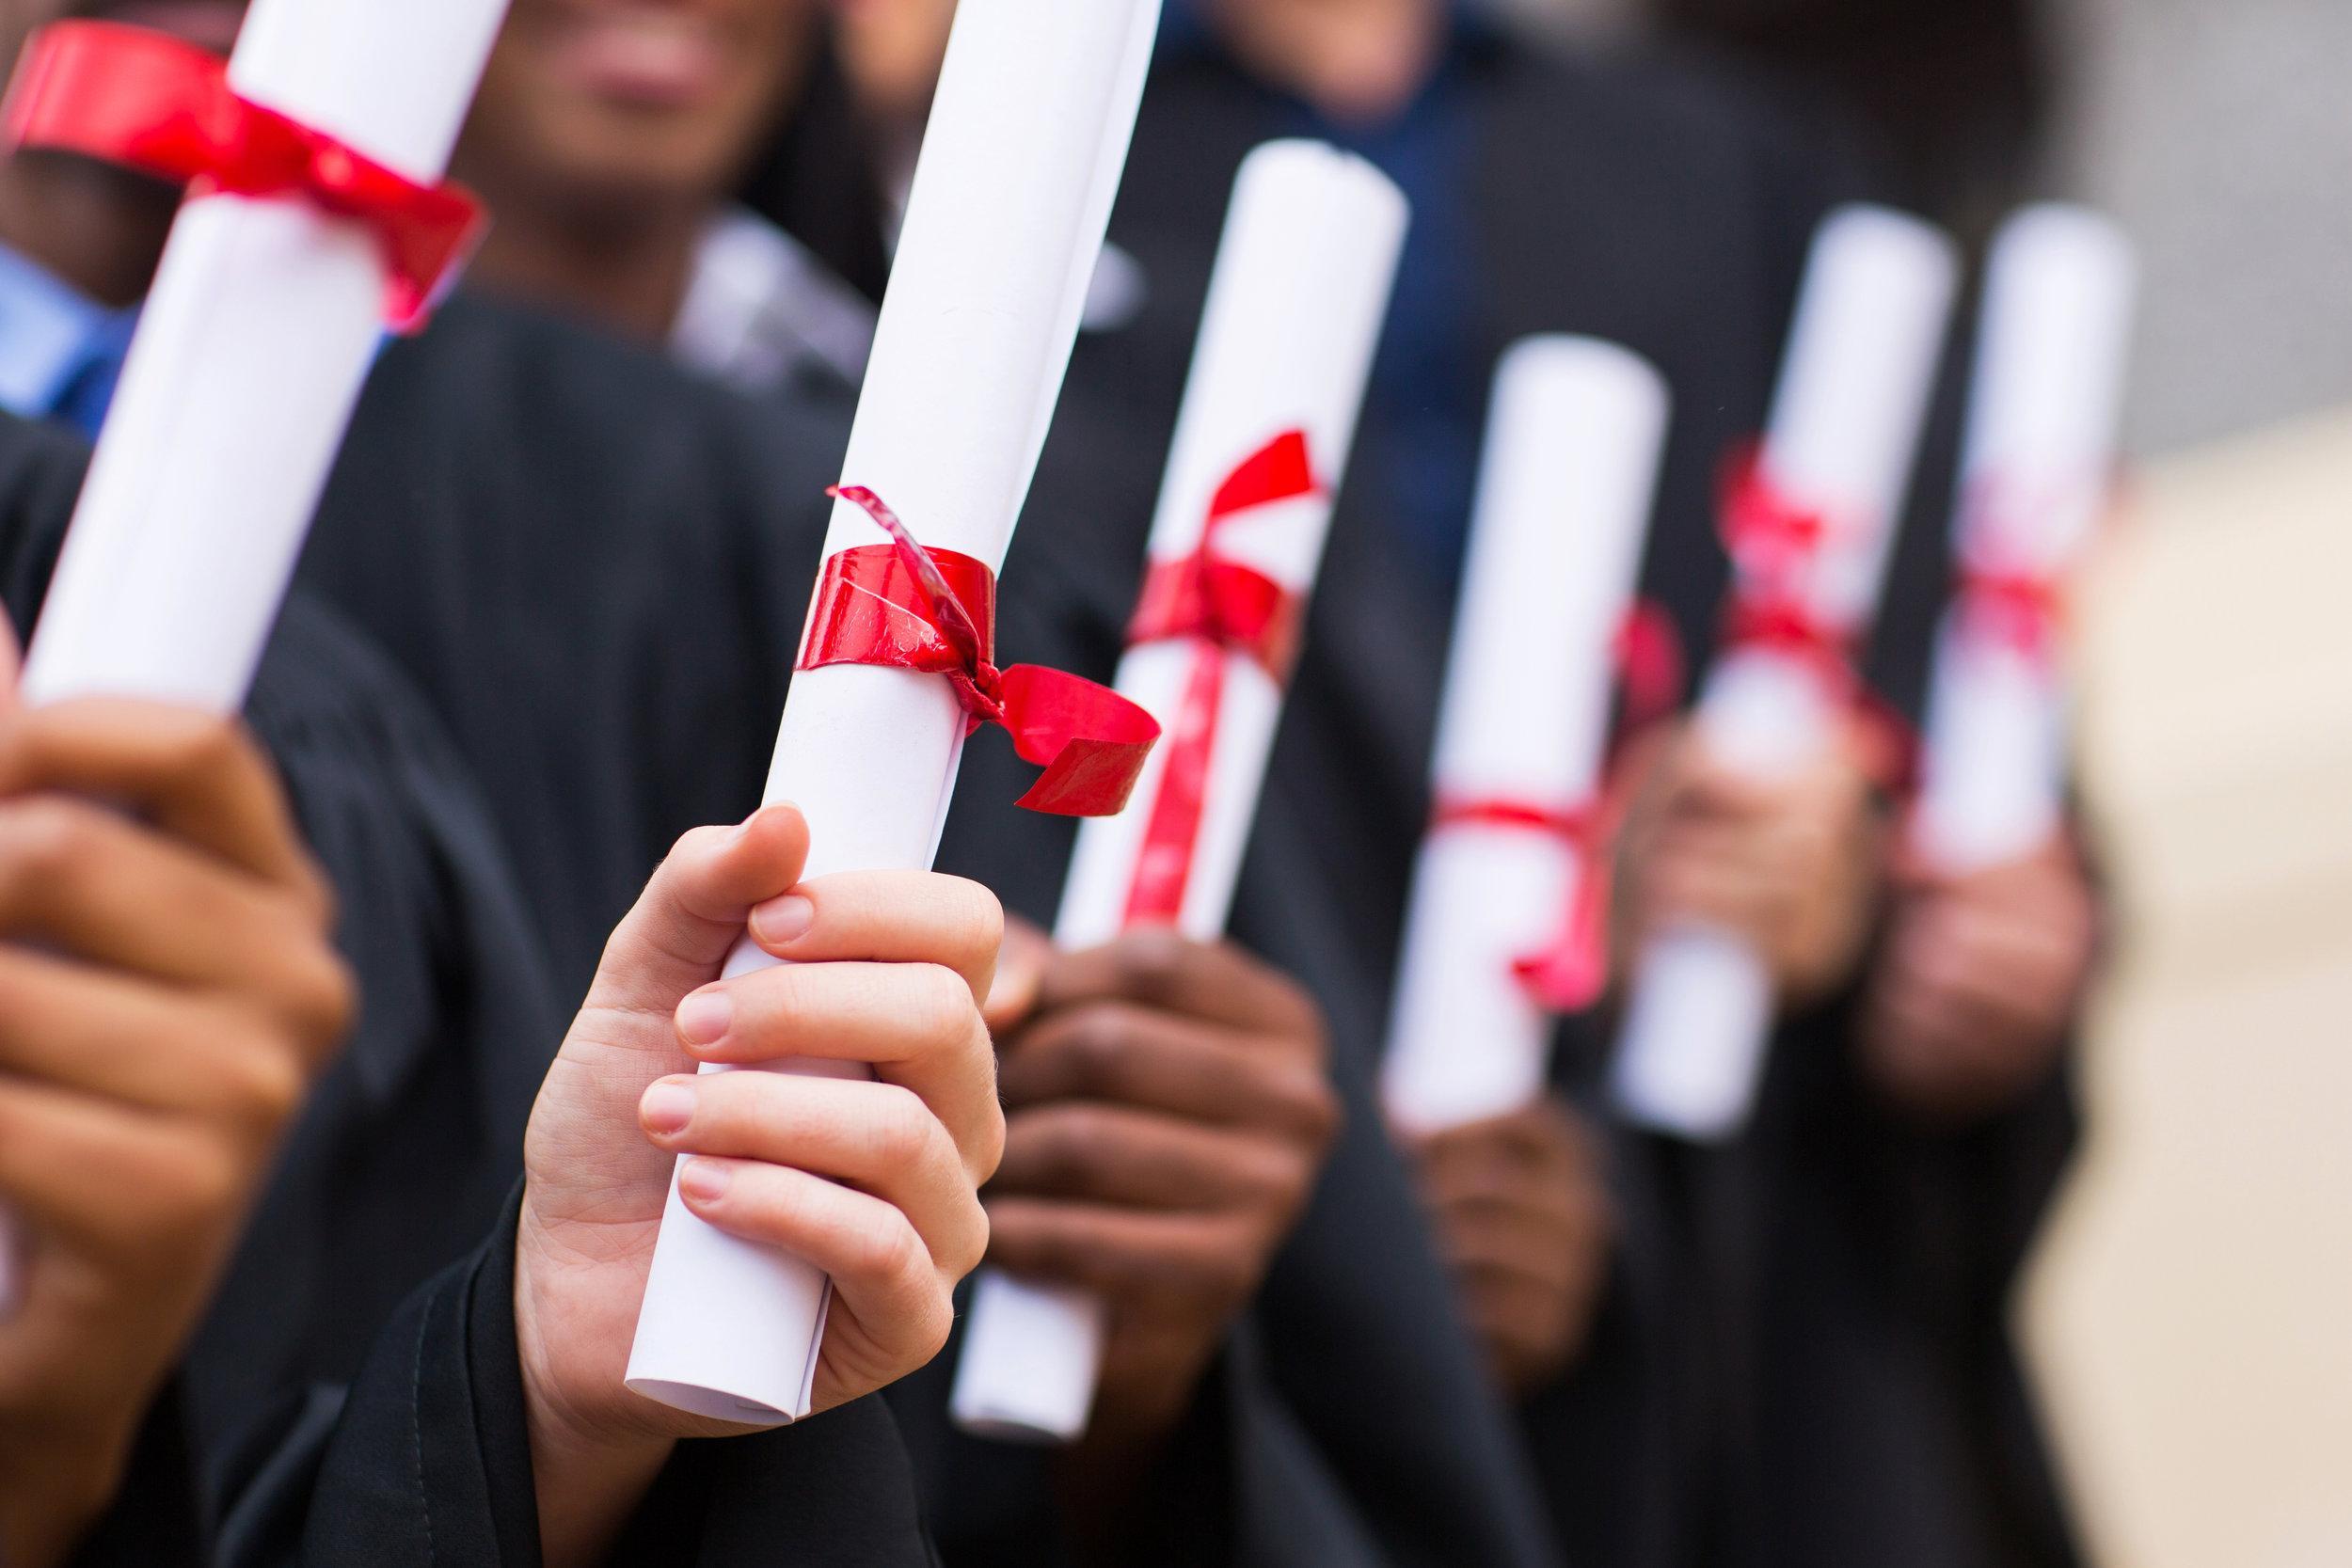 Graduates prepare to listen to a graduation speech